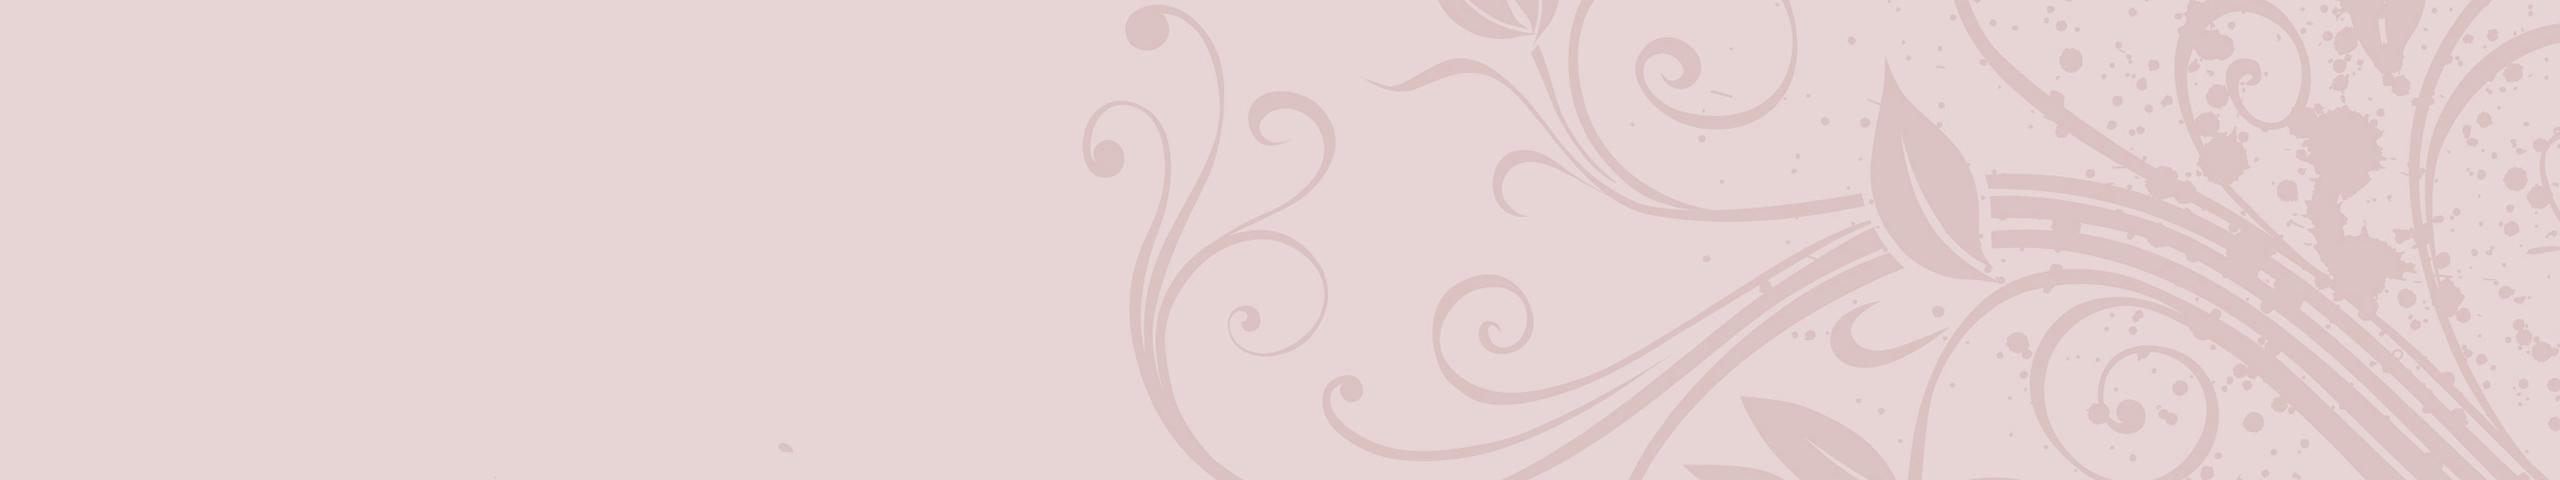 fundo-lilas-spa-flower